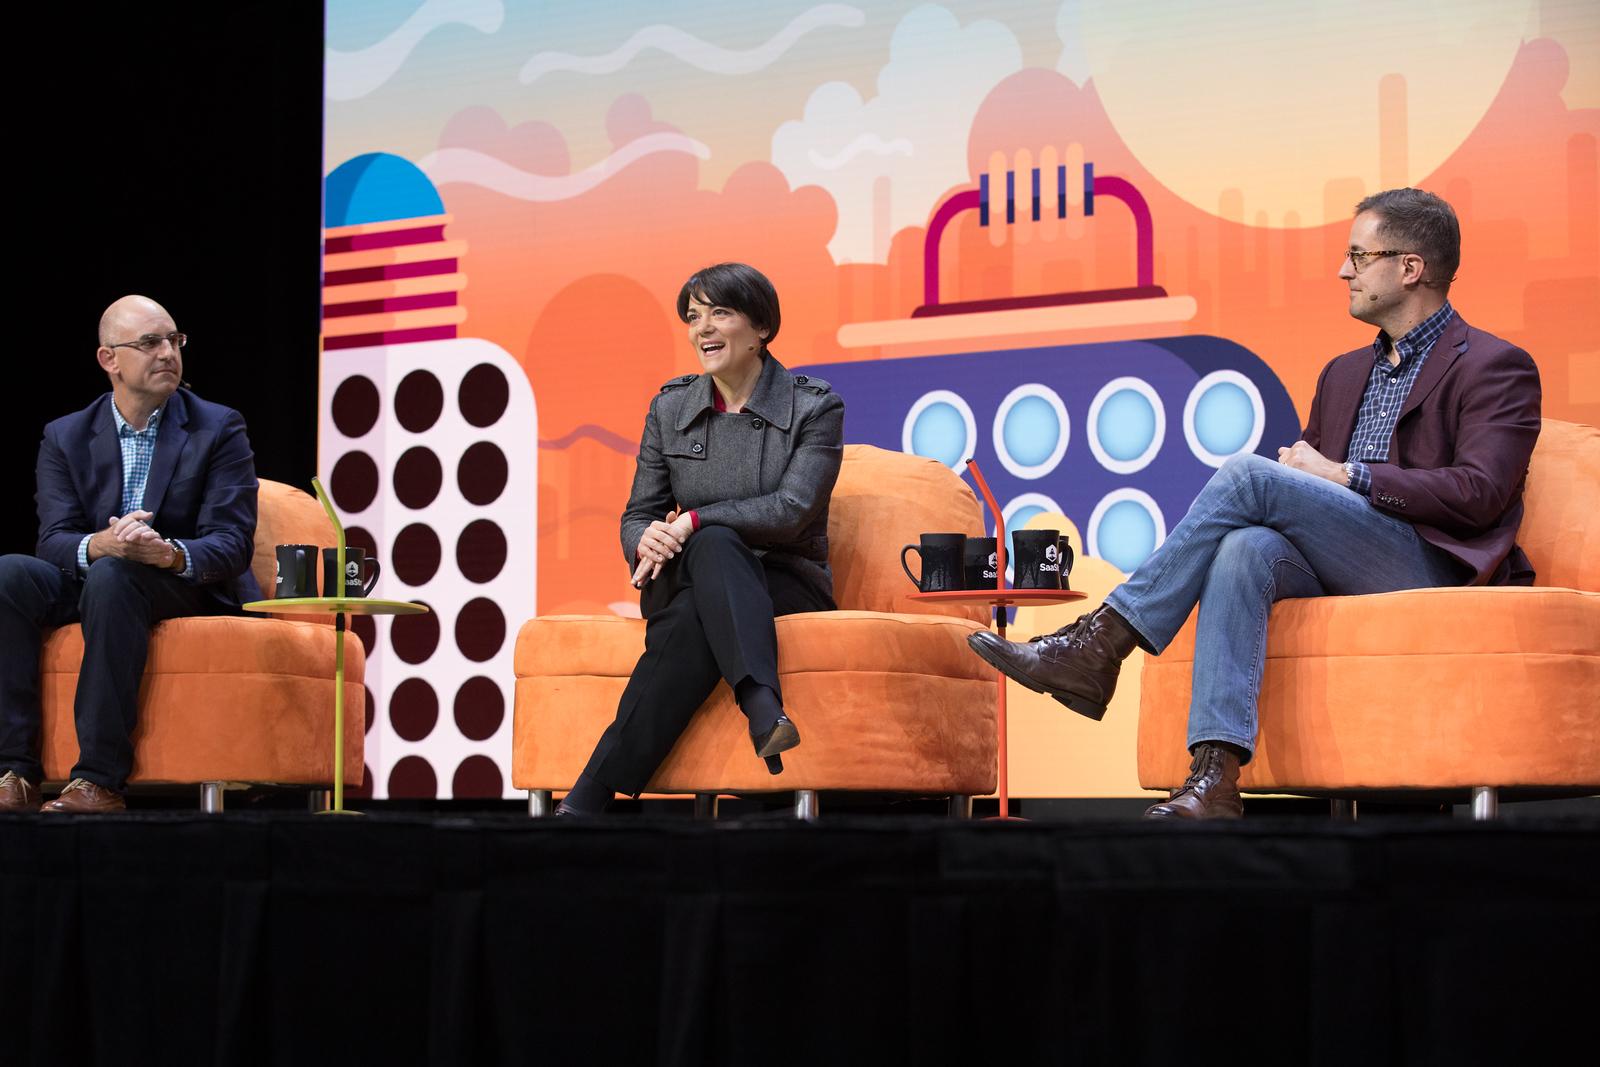 Top 5 Things That Change at $50m ARR Tien Tzuo FOUNDER & CEO / ZUORA  Aaron Skonnard CEO / PLURALSIGHT Scott Dorsey MANAGING PARTNER / HIGH ALPHA  Nitsa Zuppas CHIEF MARKETING OFFICER / VEEVA SYSTEMS